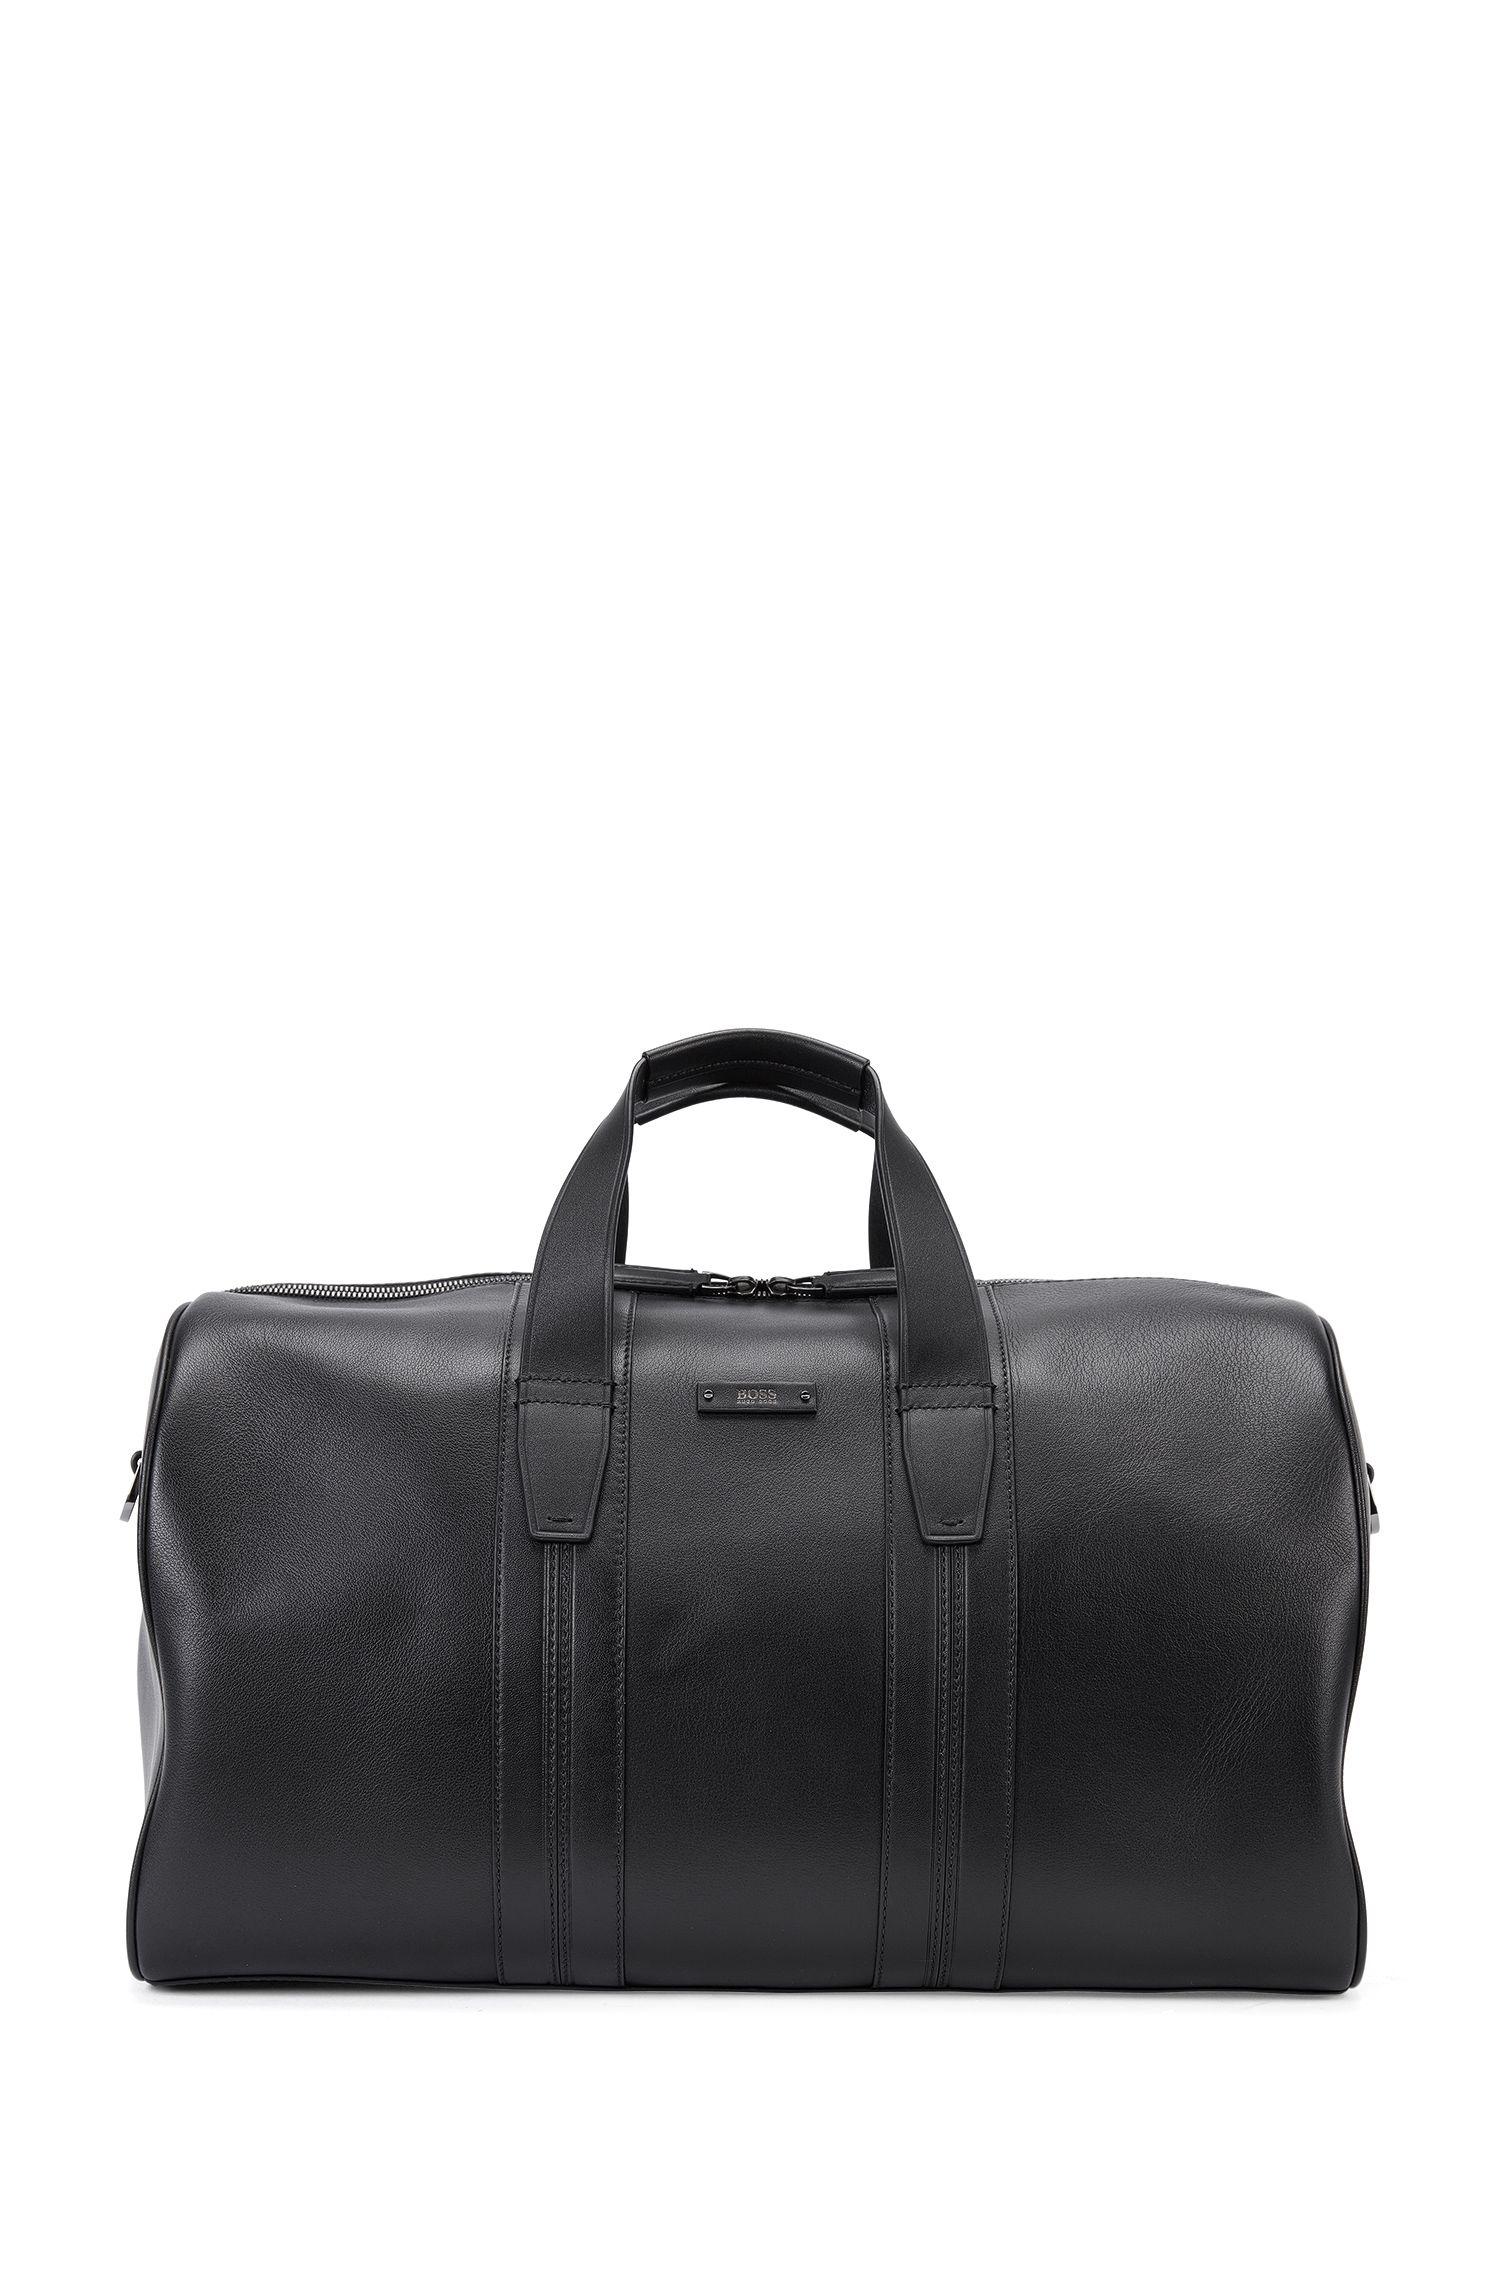 'Milano Holdall' | Leather Weekender Bag